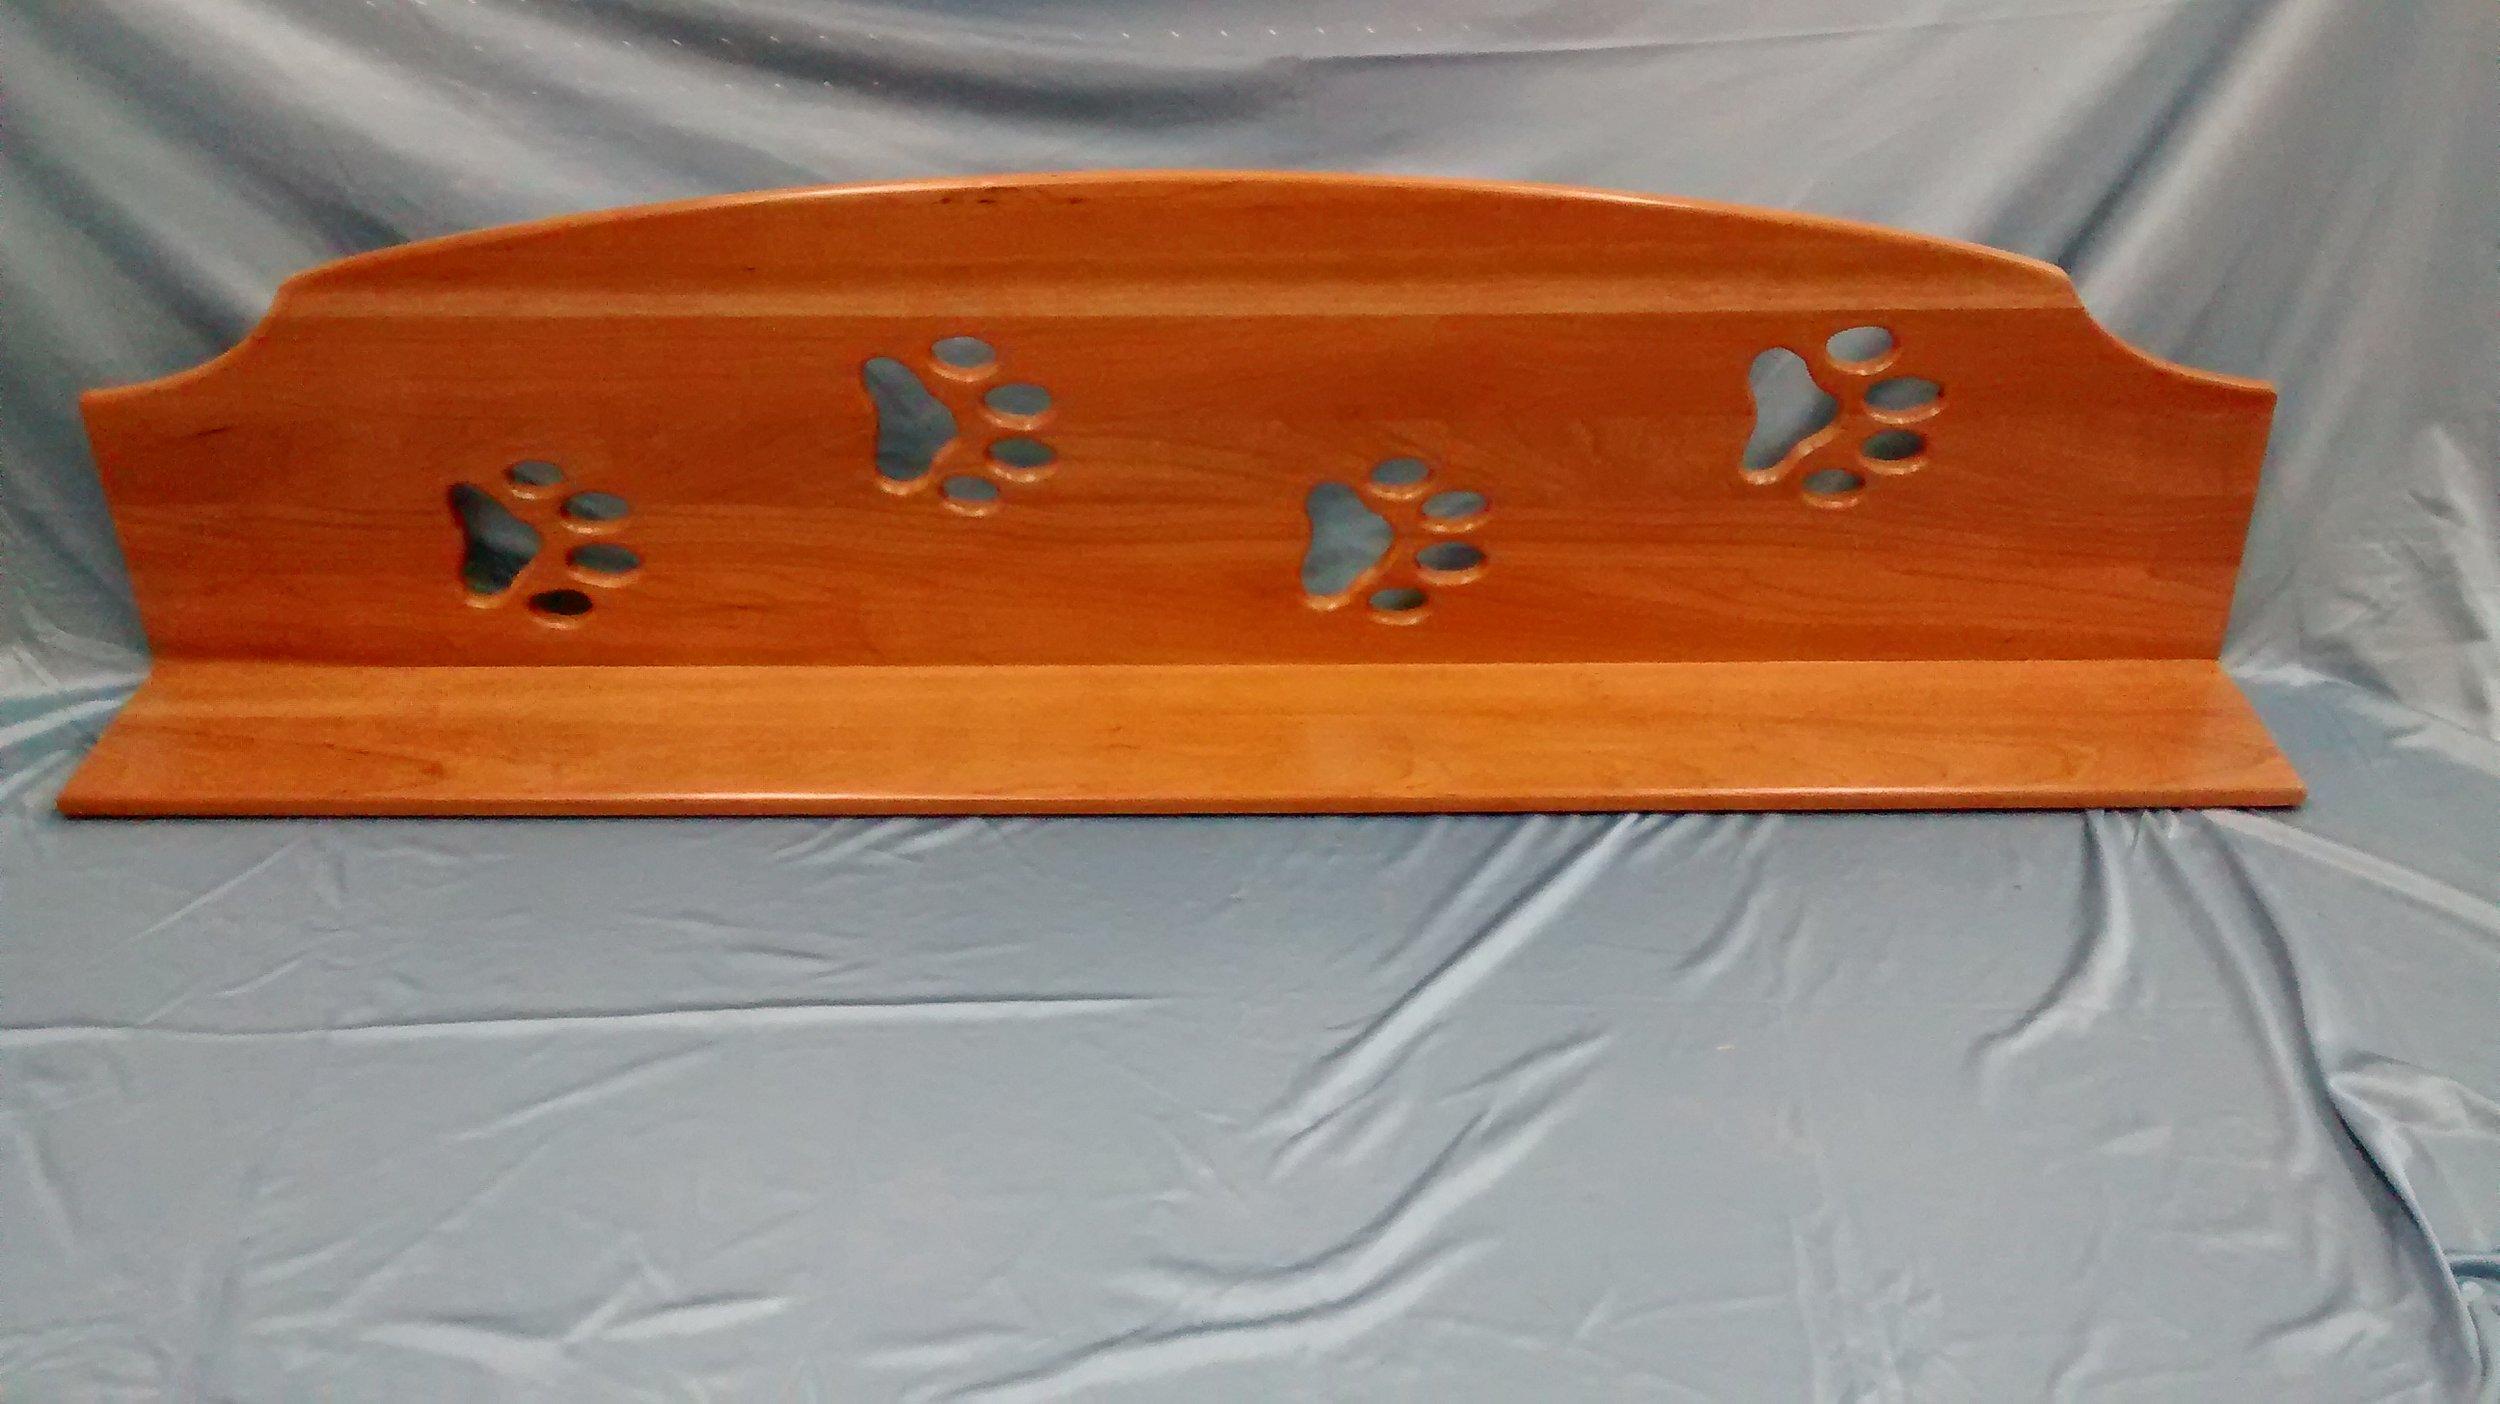 Shelf with Four Dog Pawprint Cutouts